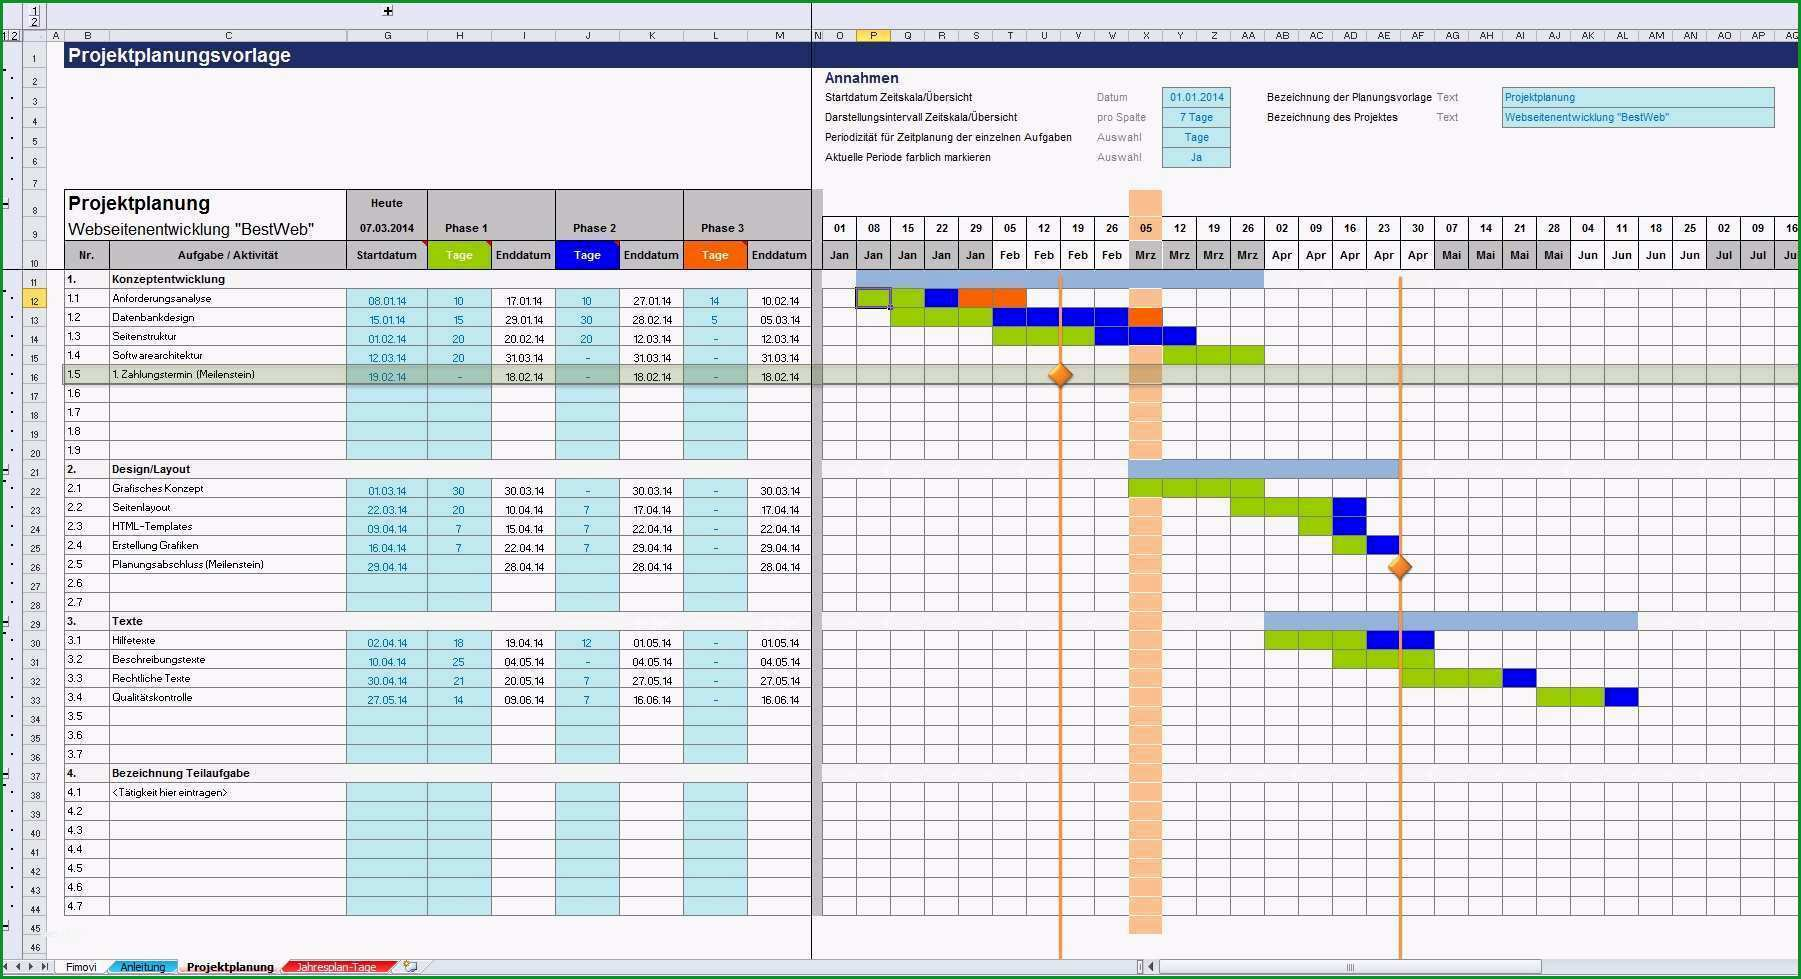 projekt planen vorlage best of excel projektplanungstool pro zum